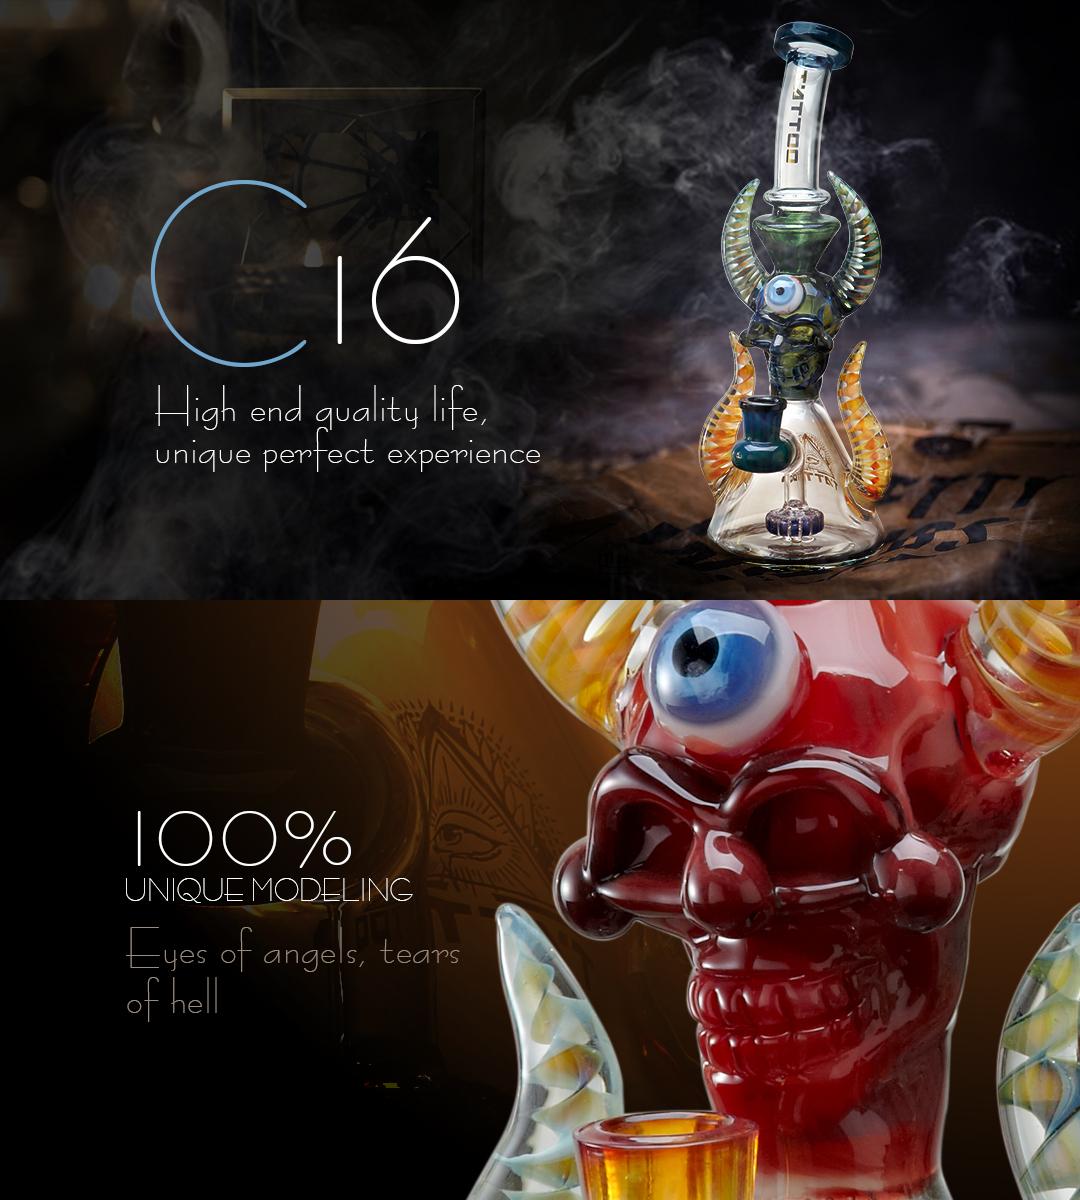 C16 Glass Bong